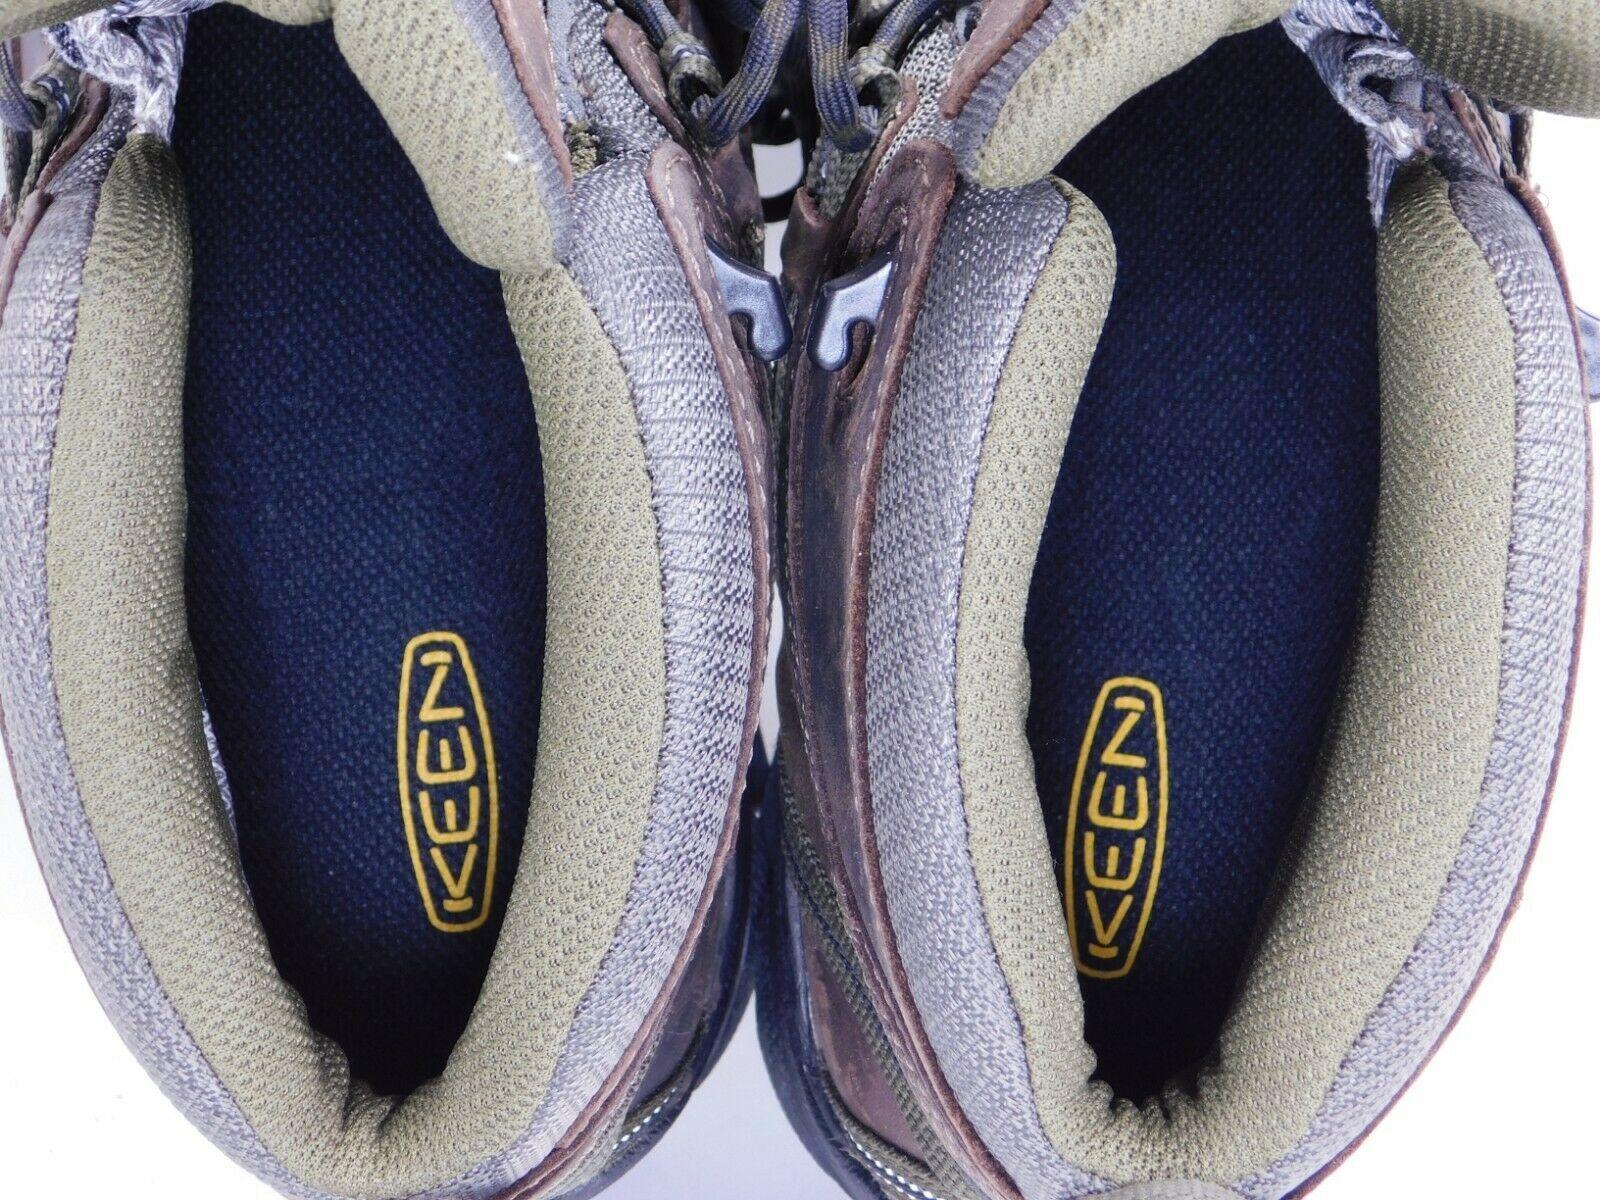 Keen Targhee II Mid Size 11 2E WIDE EU 44.5 Men's WP Trail Hiking Boots 1018118